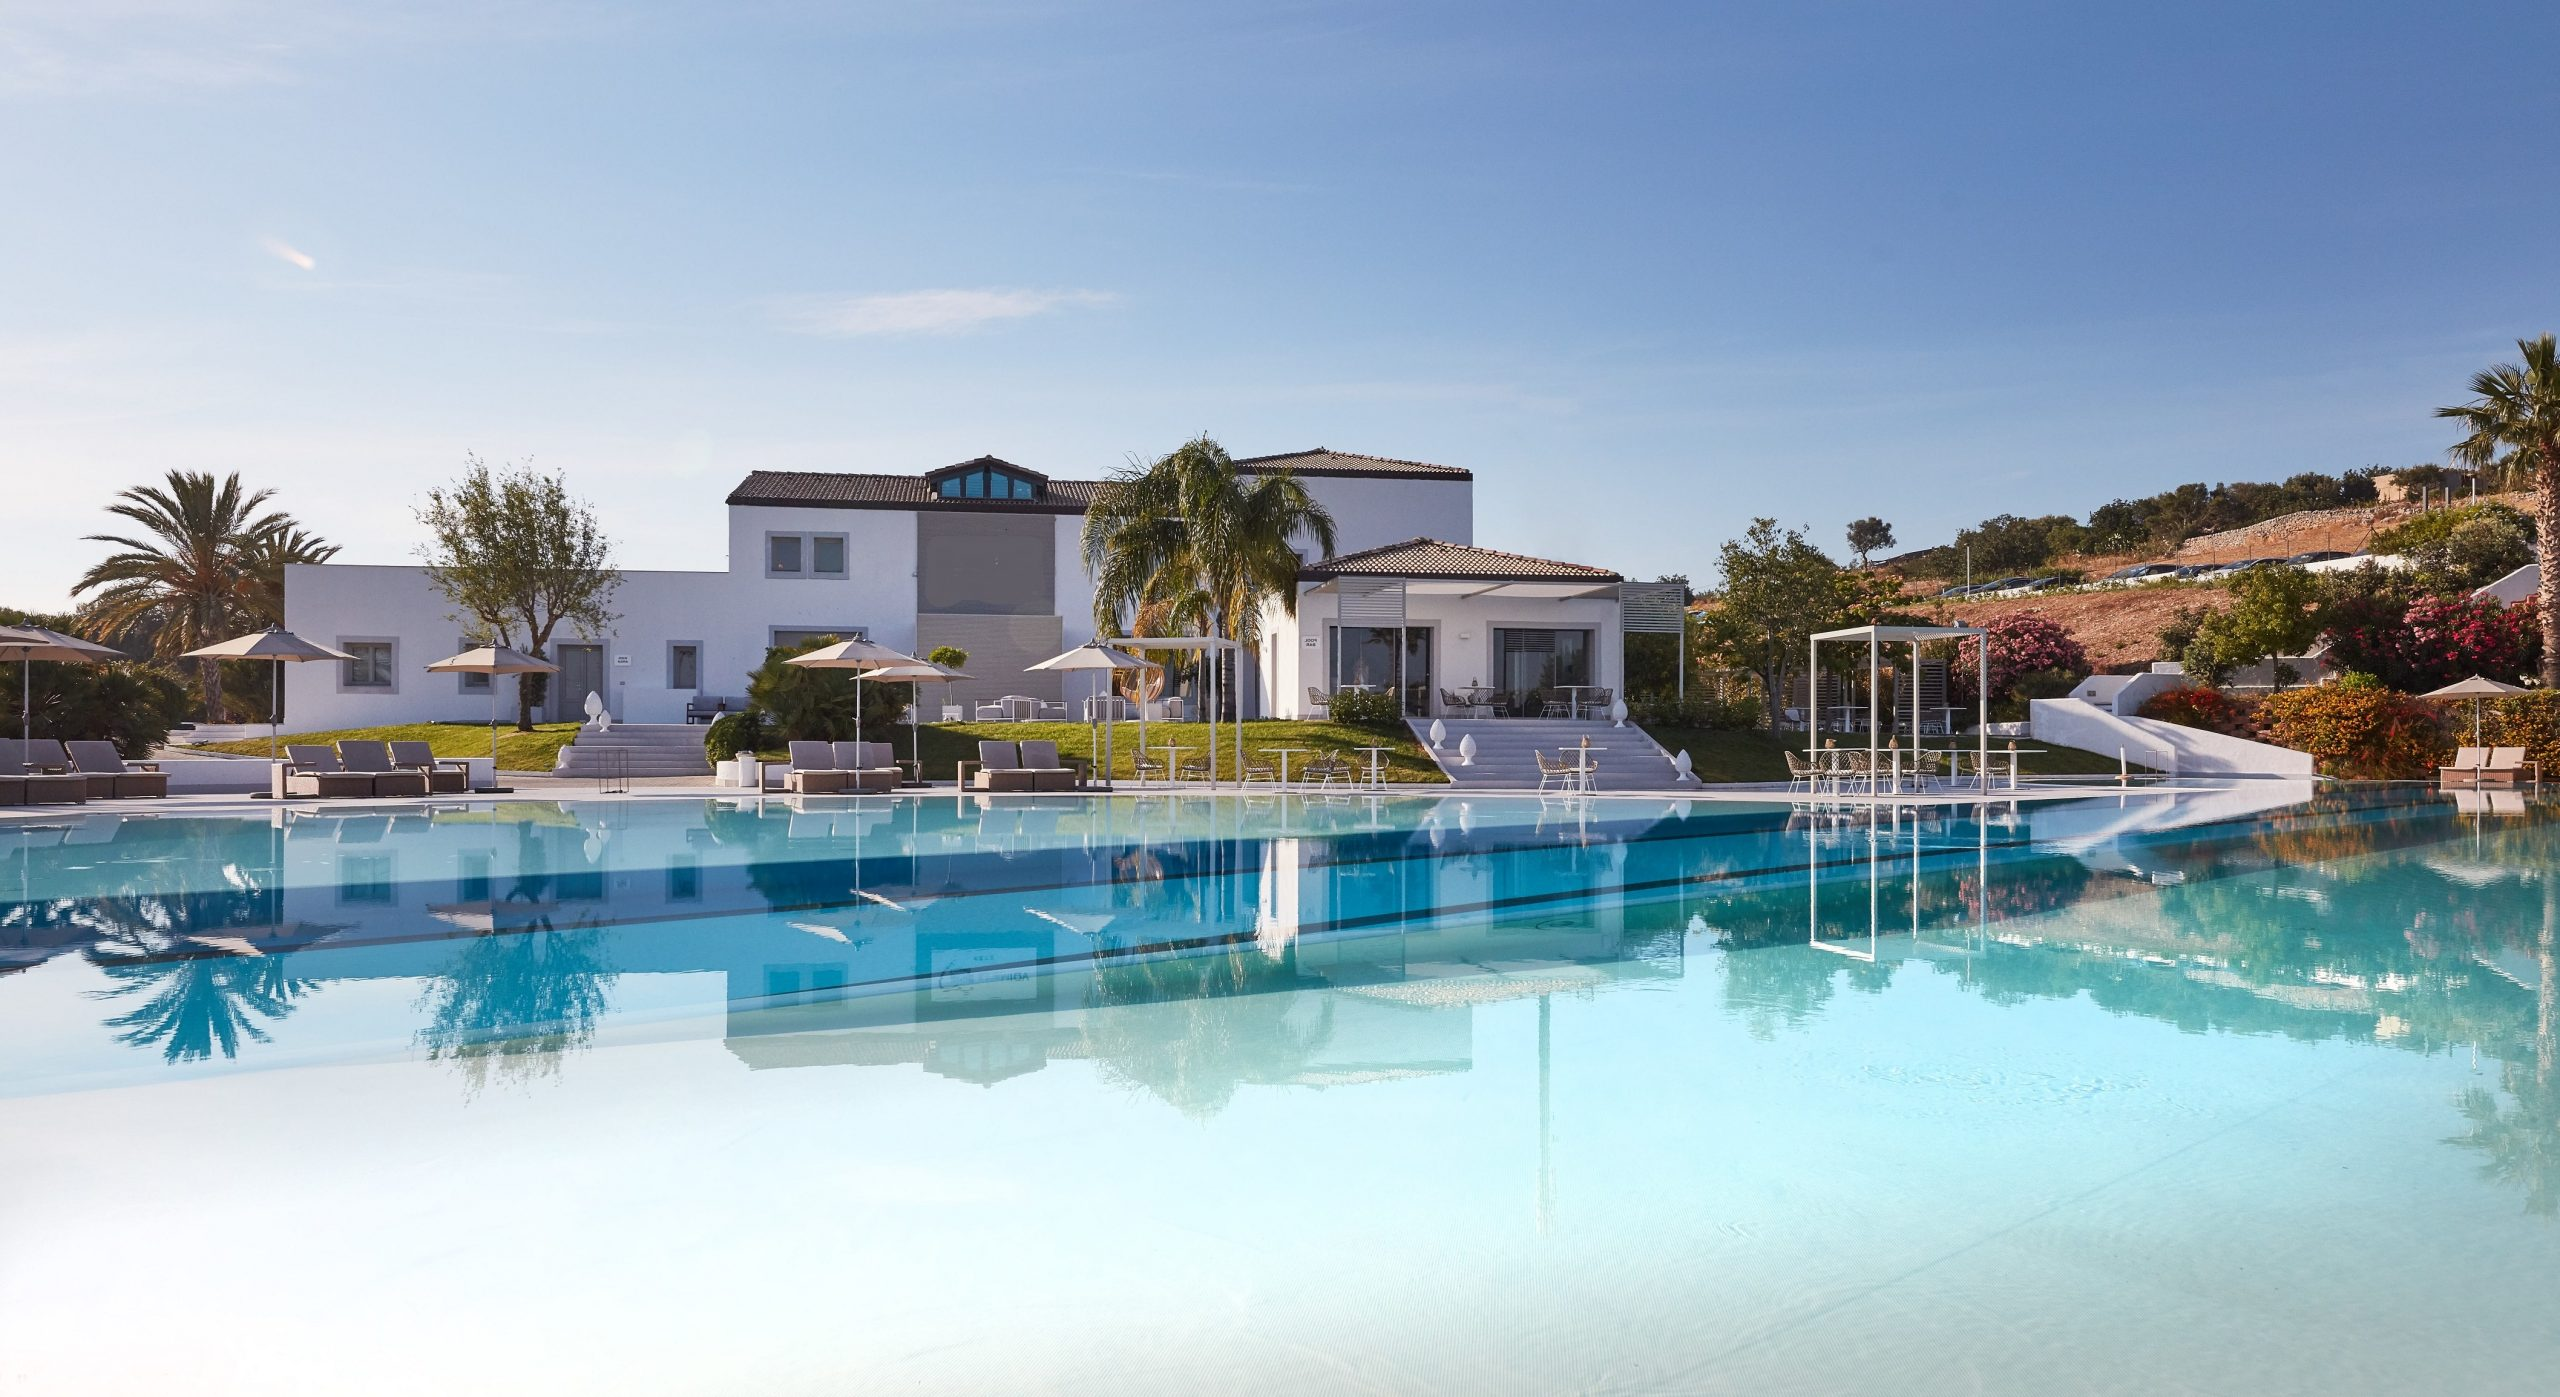 Event Resort Sicily - Title